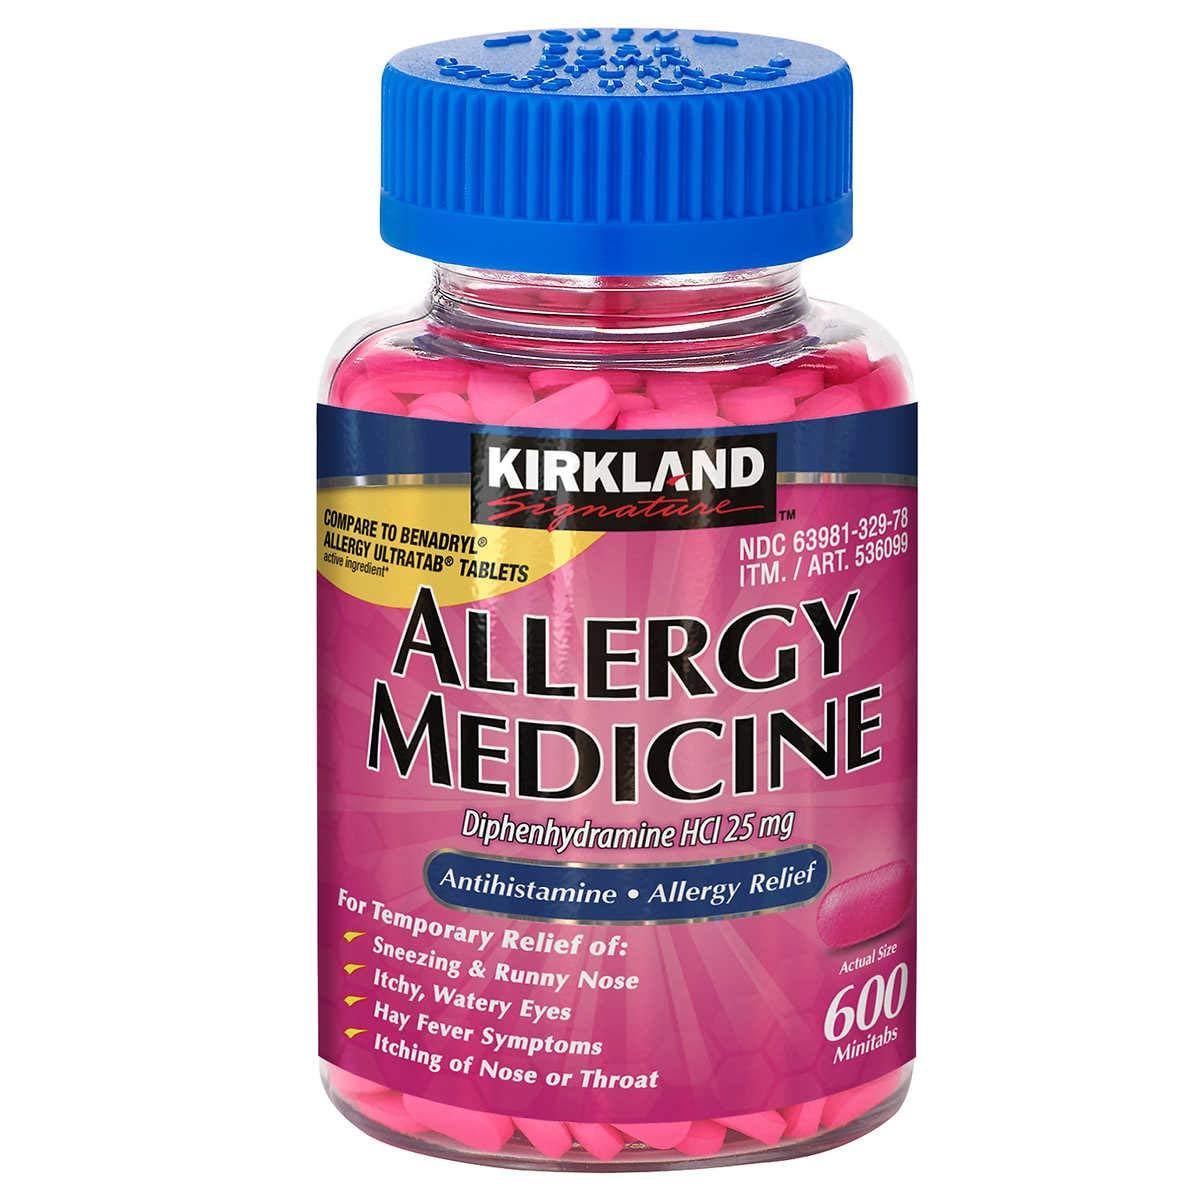 Kirkland Signature Allergy Medicine Diphenhydramine HCI 25 mg - 600 Tablets